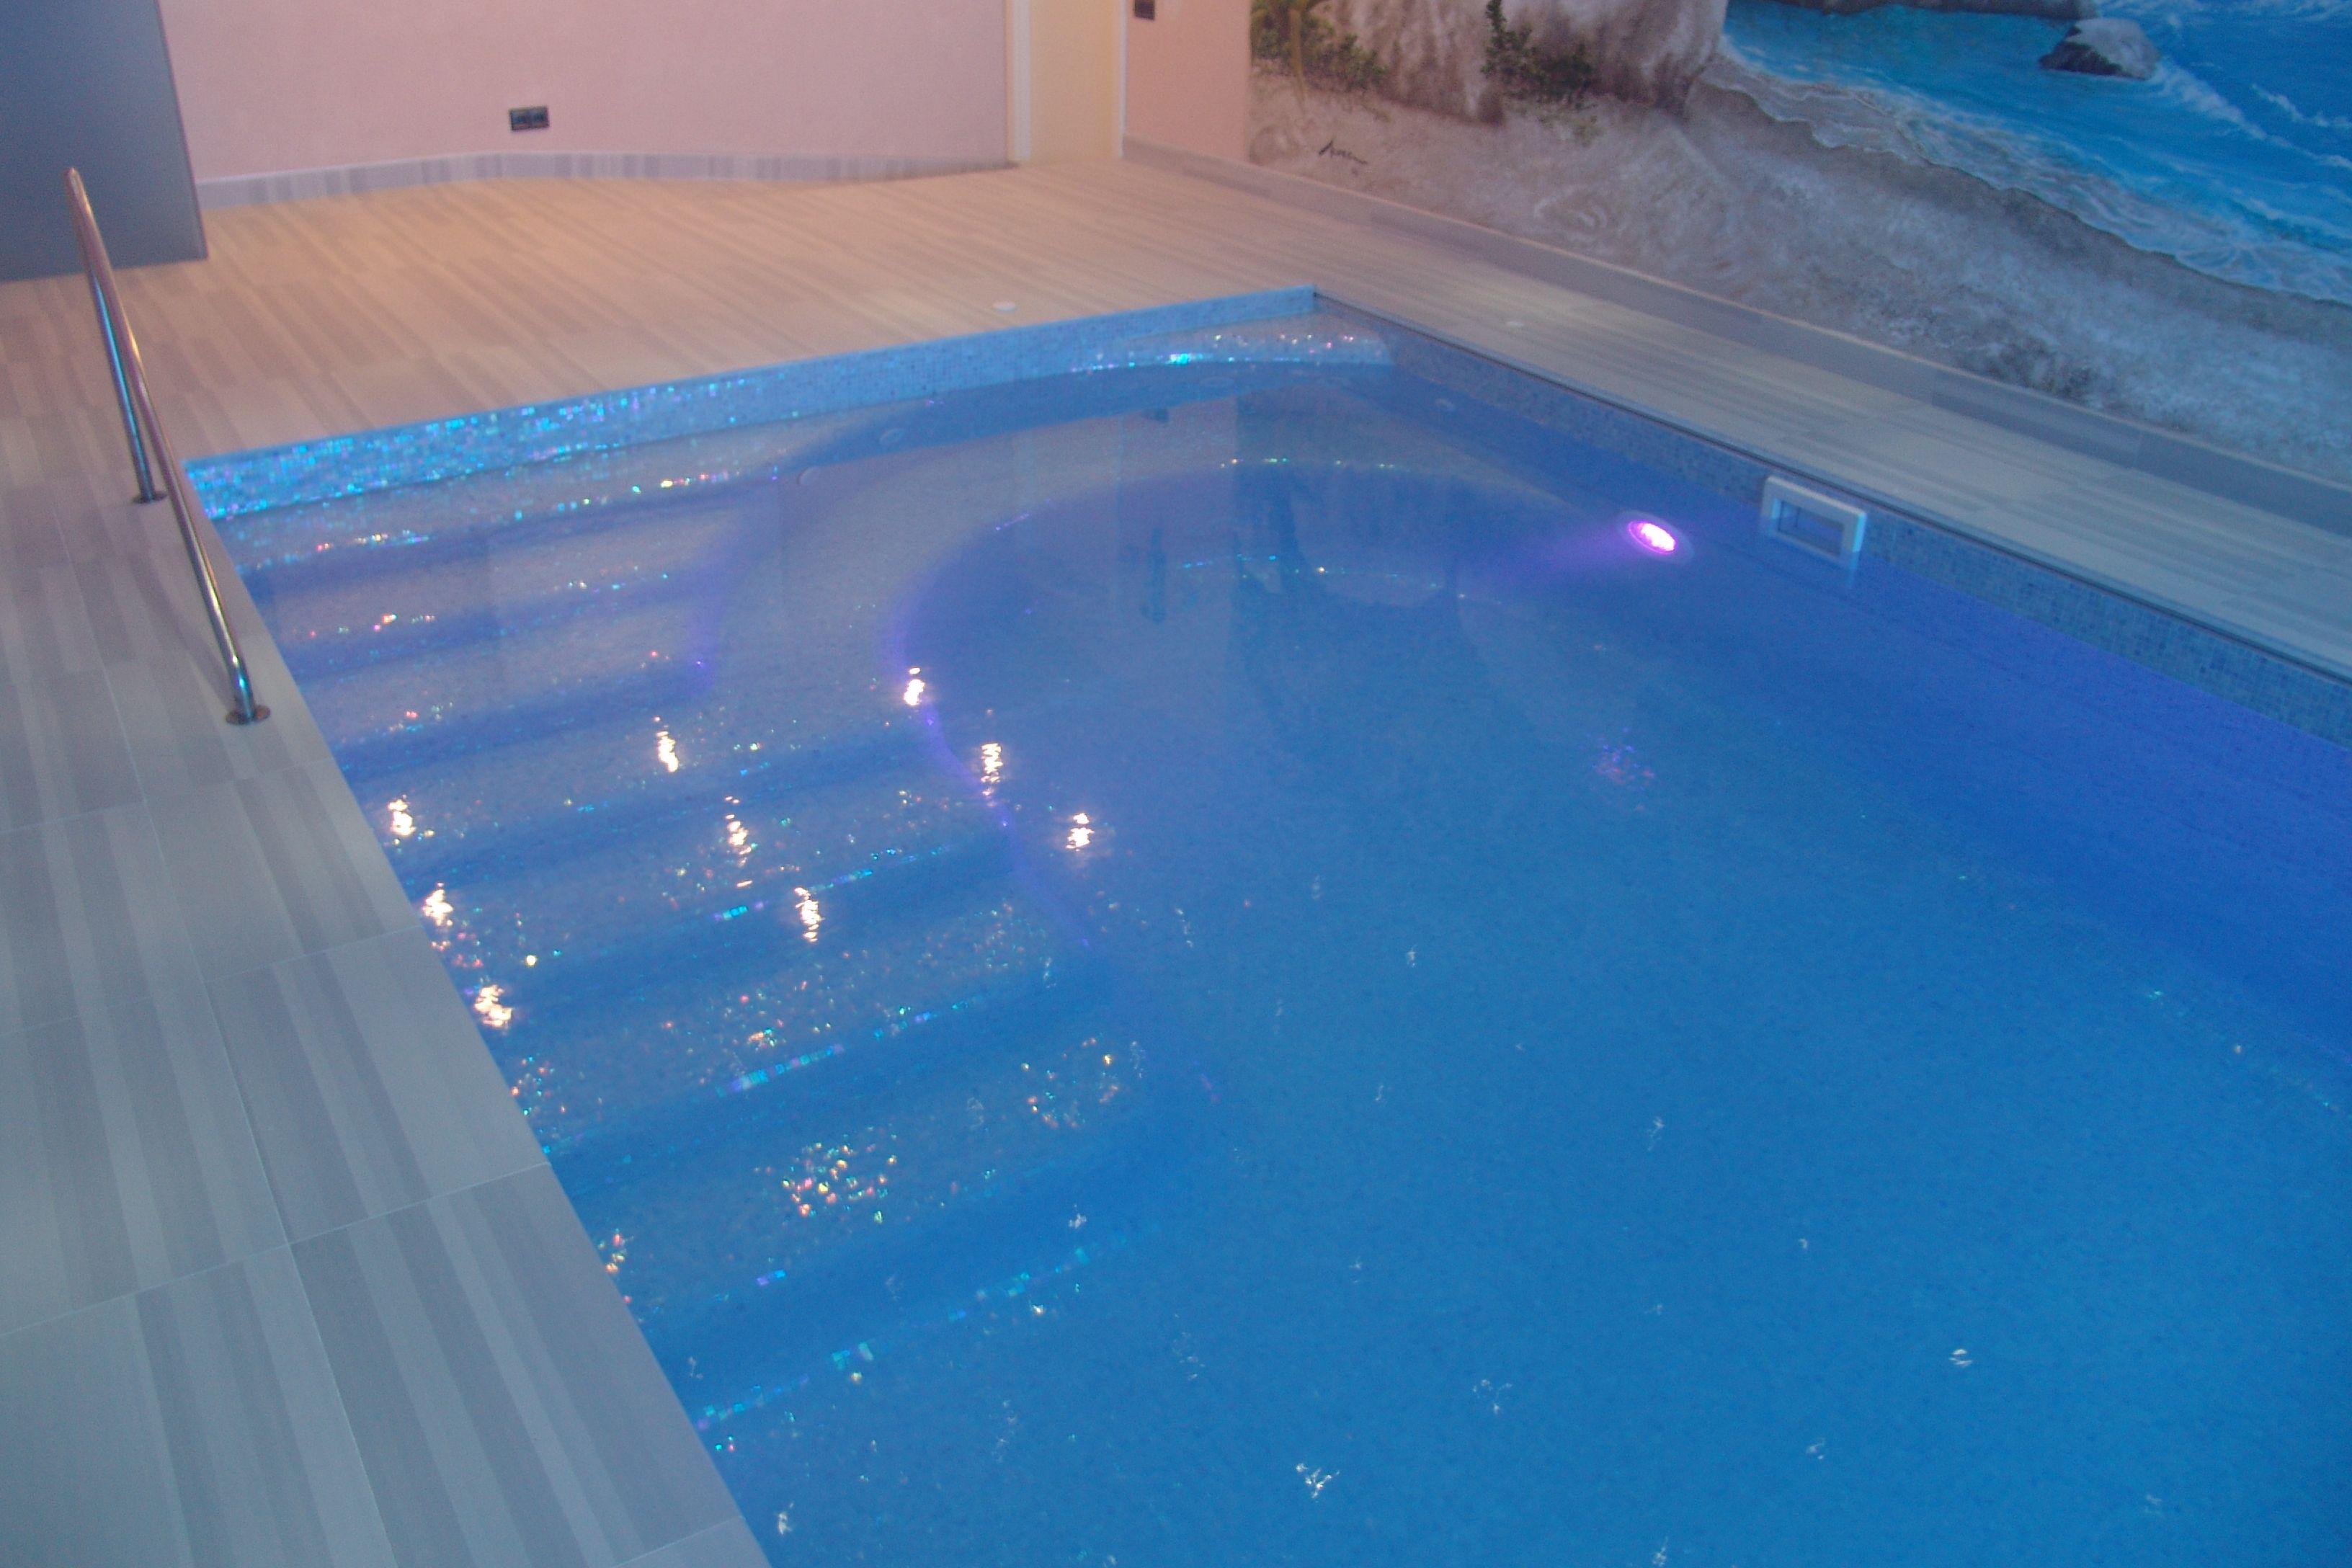 Piscina de ferr n piscinas piscina situada en un garaje - Gresite piscinas colores ...